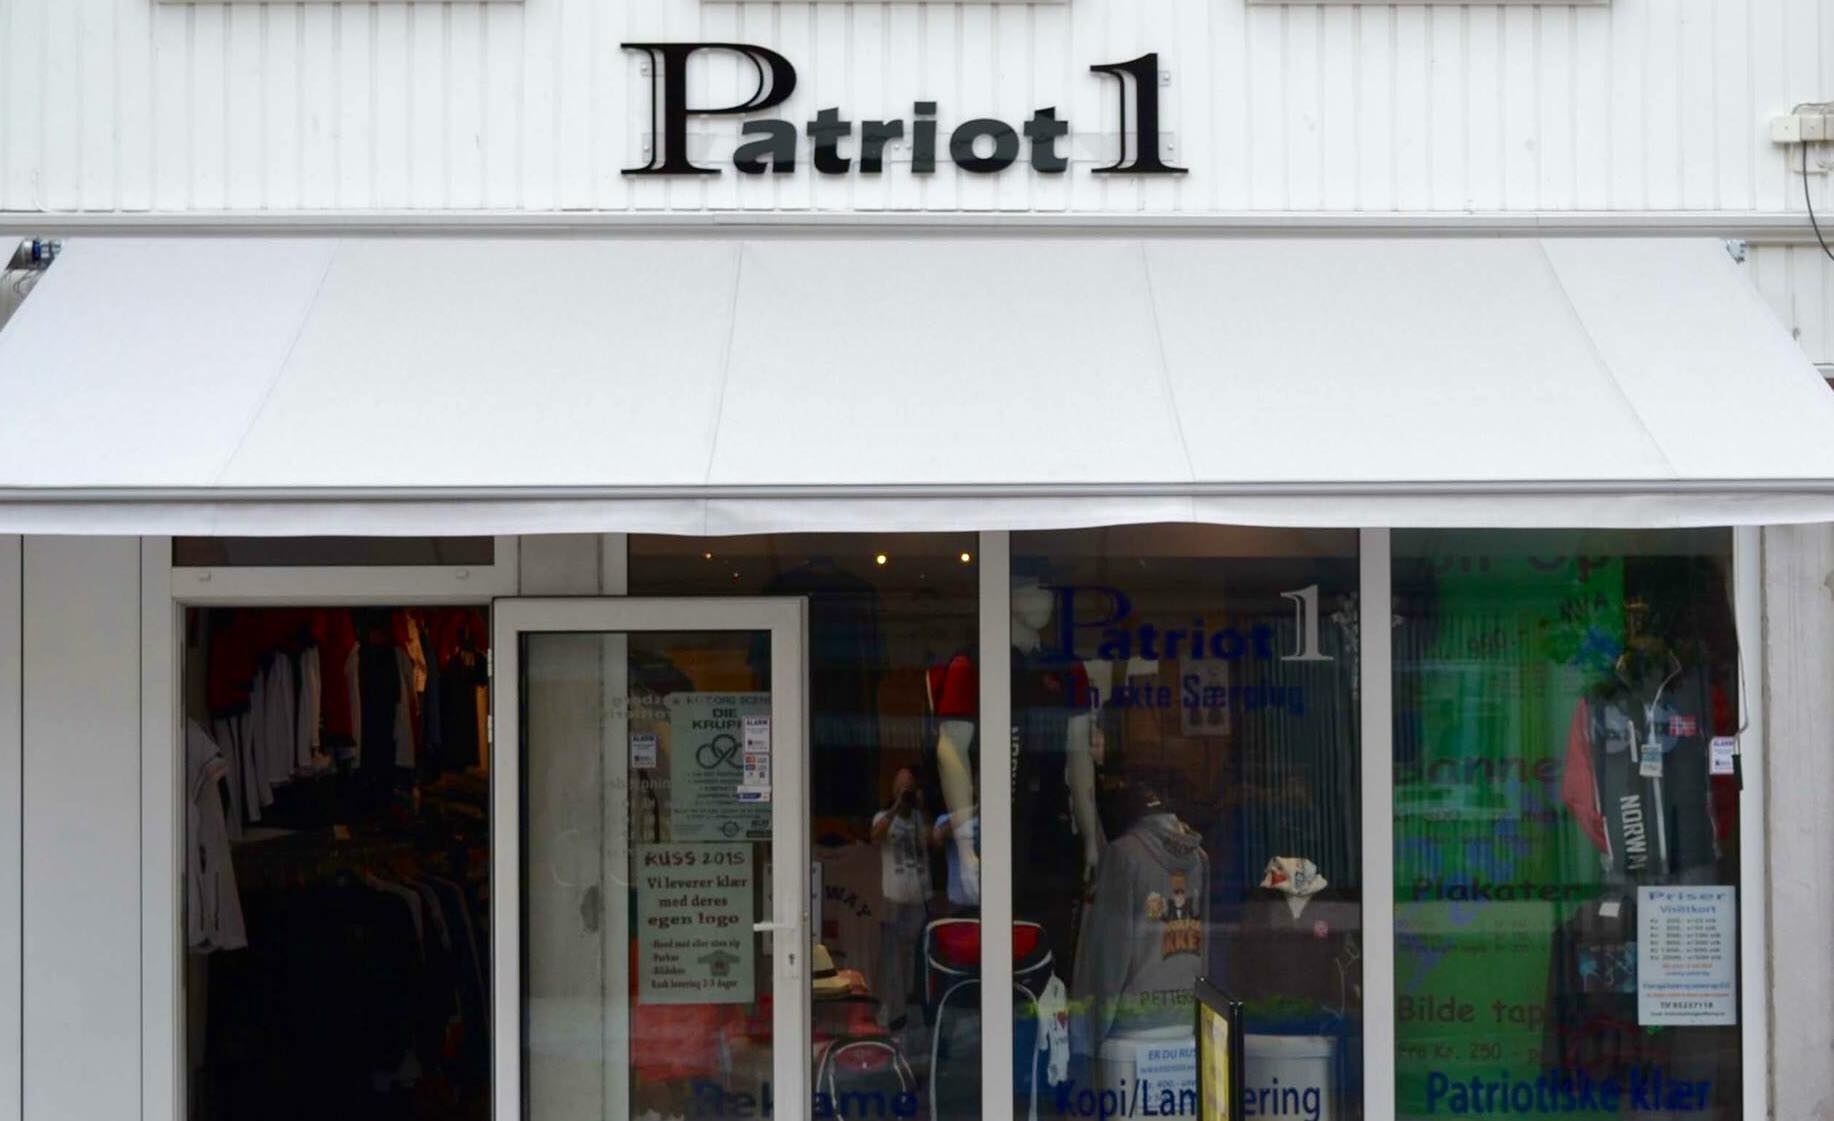 patriot1_trykk_pa_russeklaer_Sarpsborg_Norge_firmaprofilering